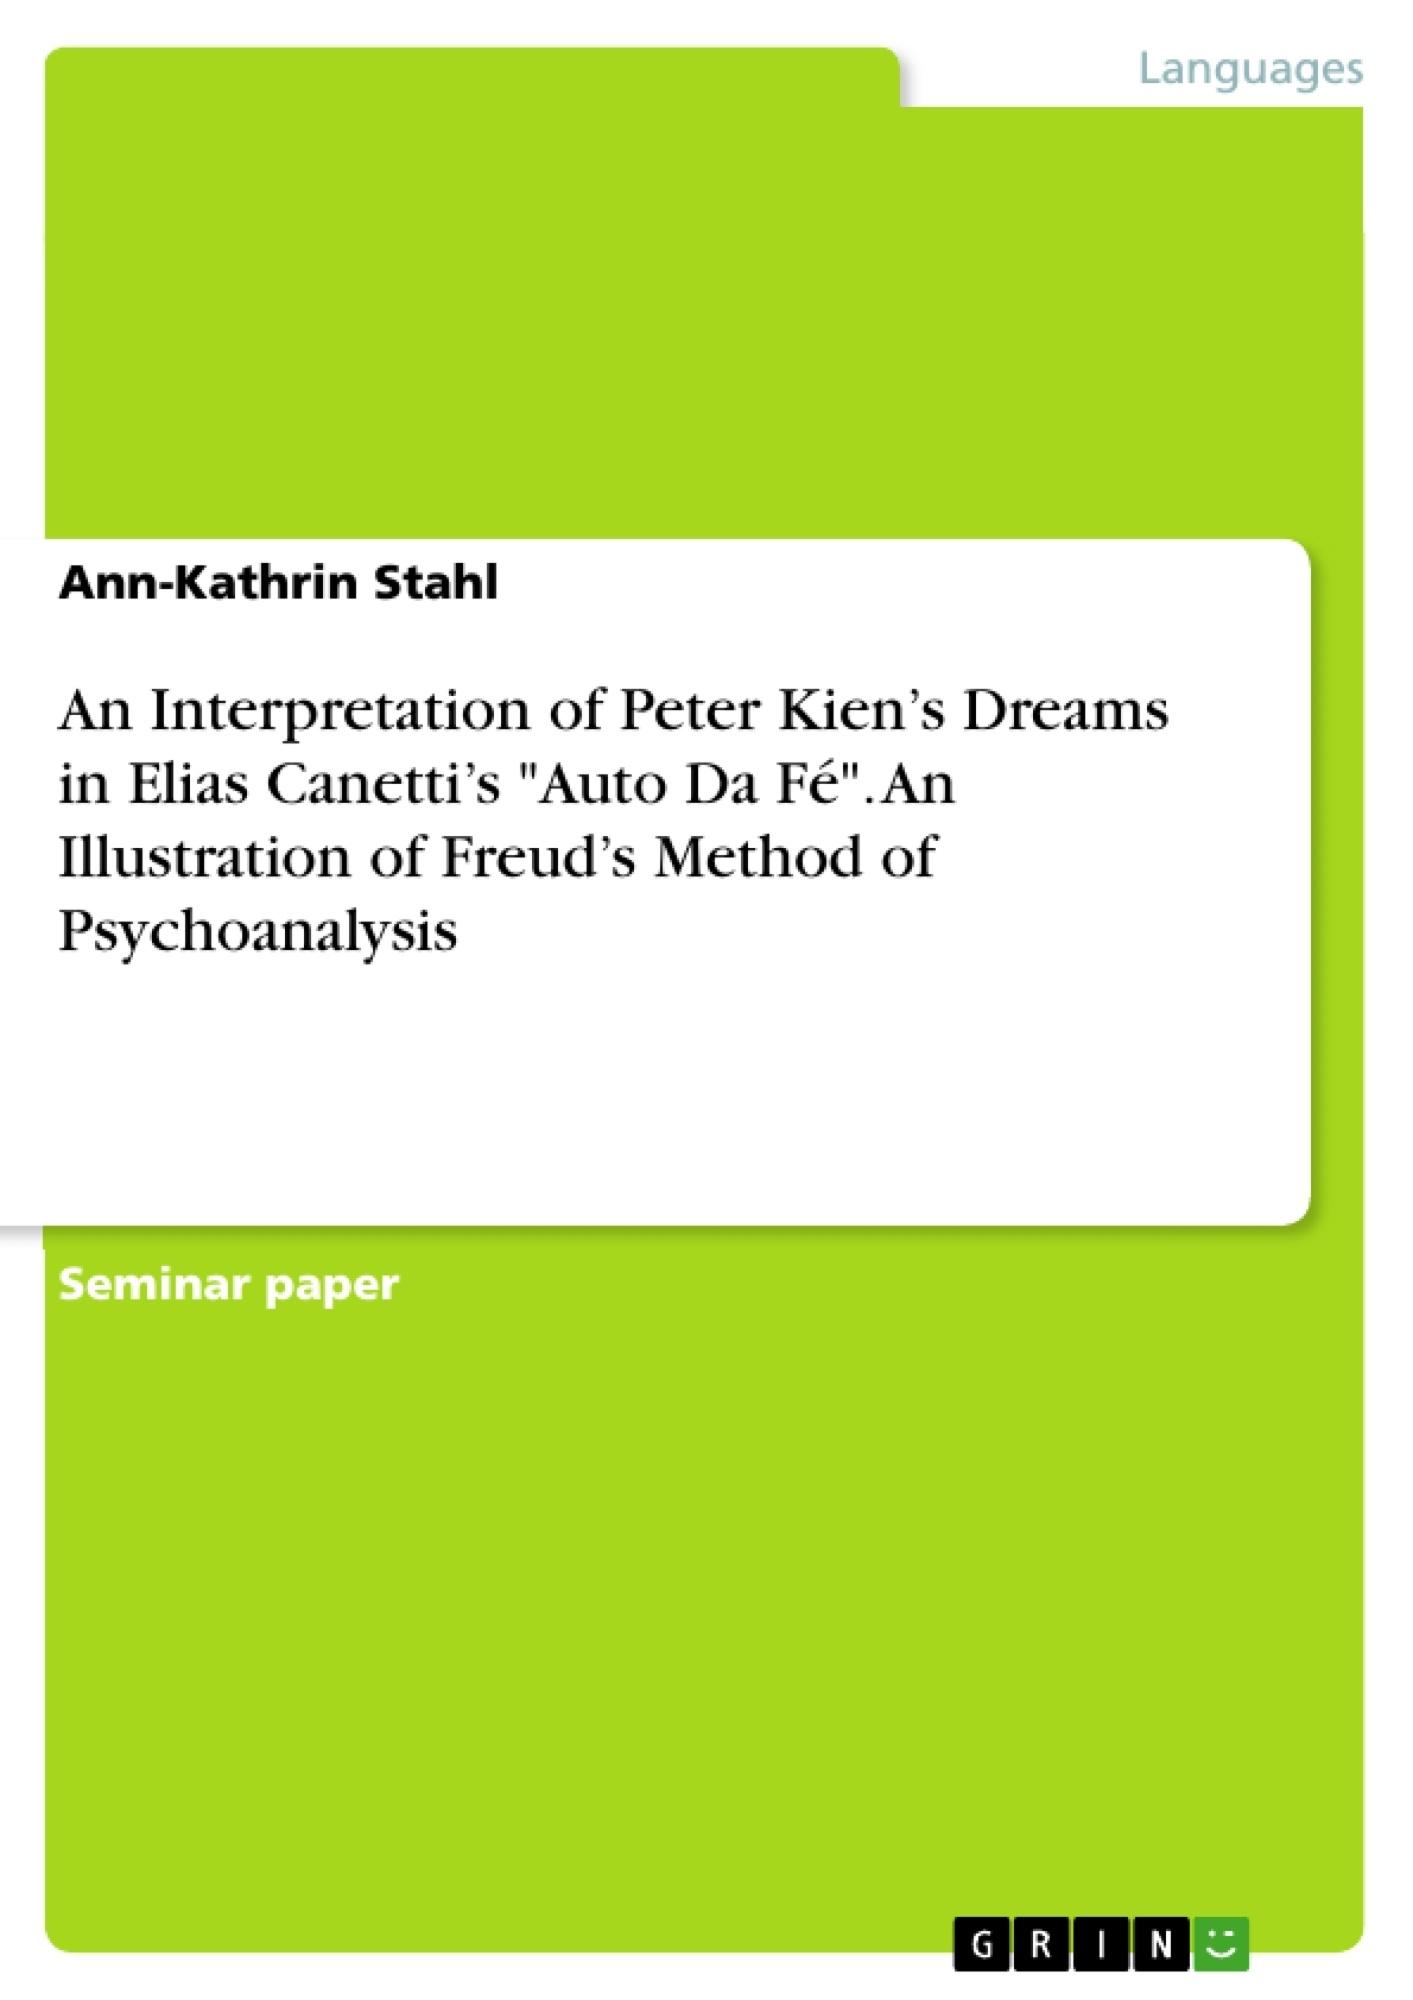 "Title: An Interpretation of Peter Kien's Dreams in Elias Canetti's ""Auto Da Fé"". An Illustration of Freud's Method of Psychoanalysis"